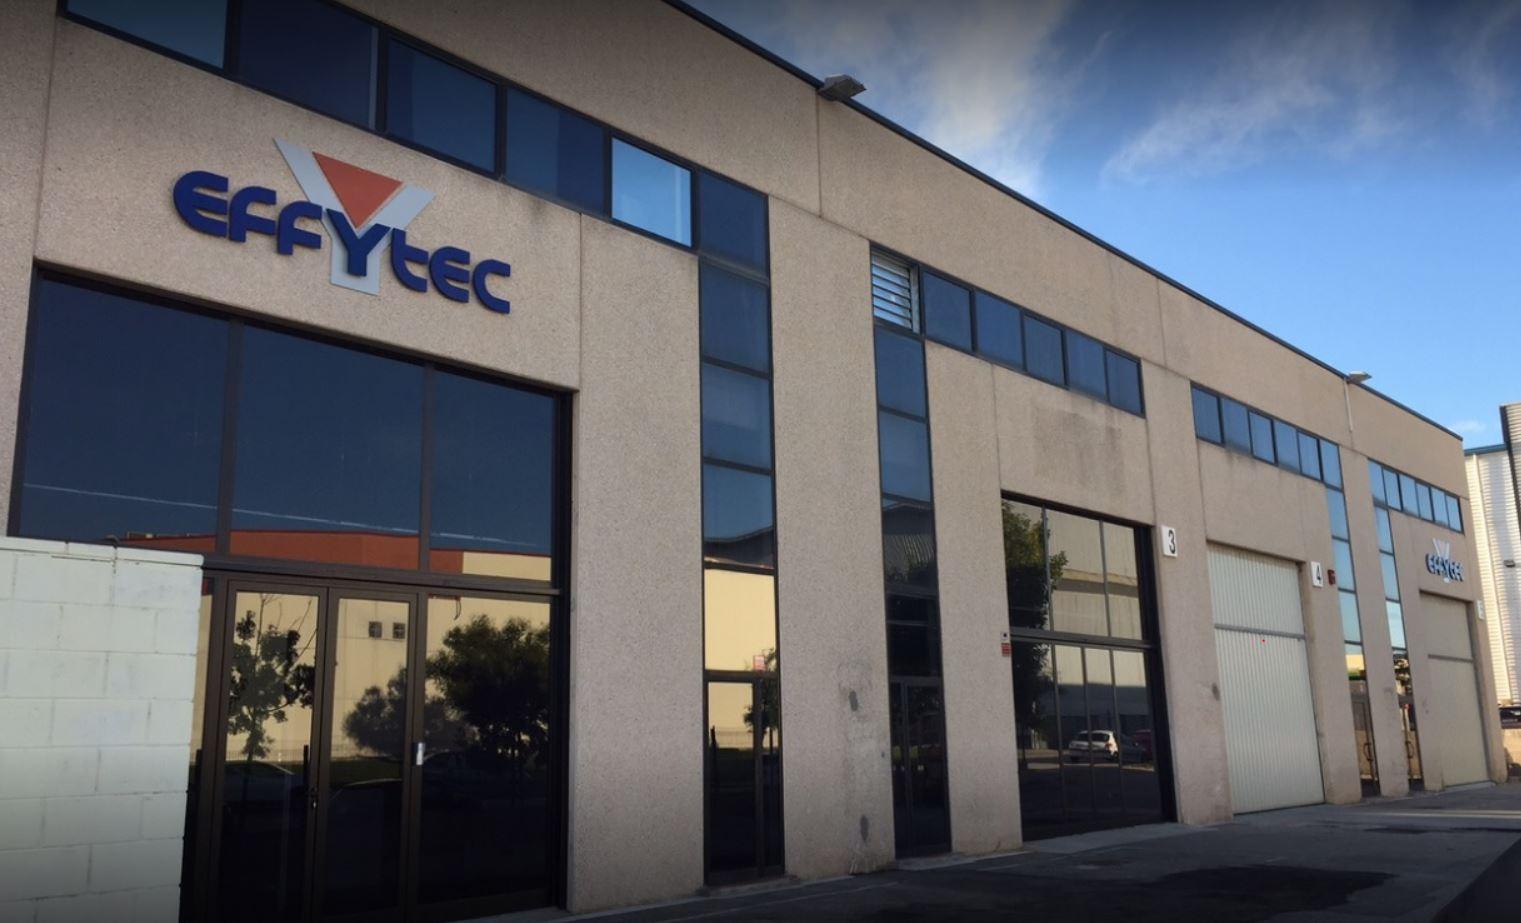 Sede de la empresa Effytec.